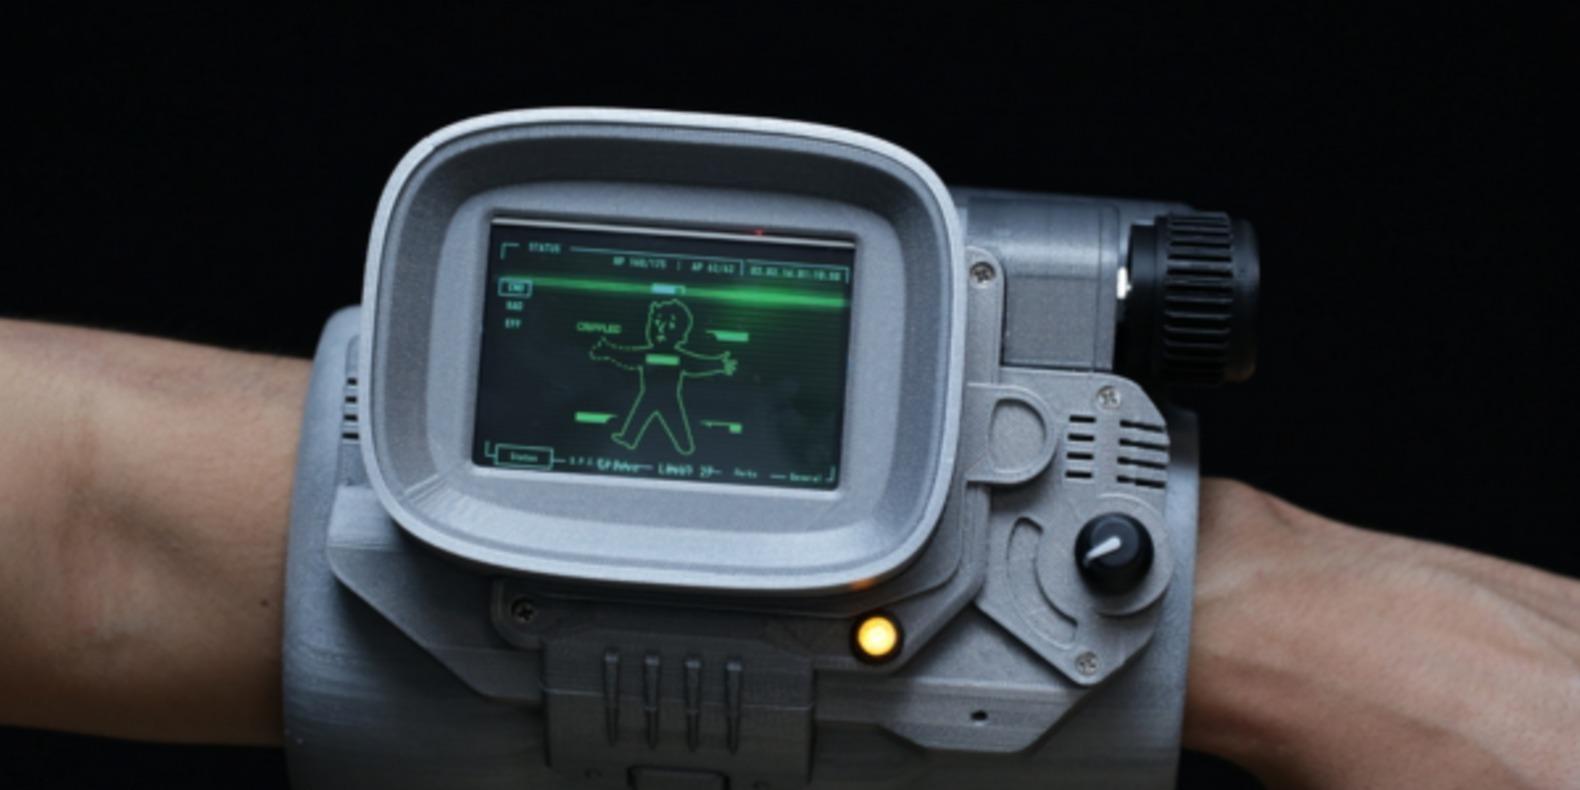 pip-boy fallout imprimé en 3D printed fichier 3D stl cults diy adafruit 1